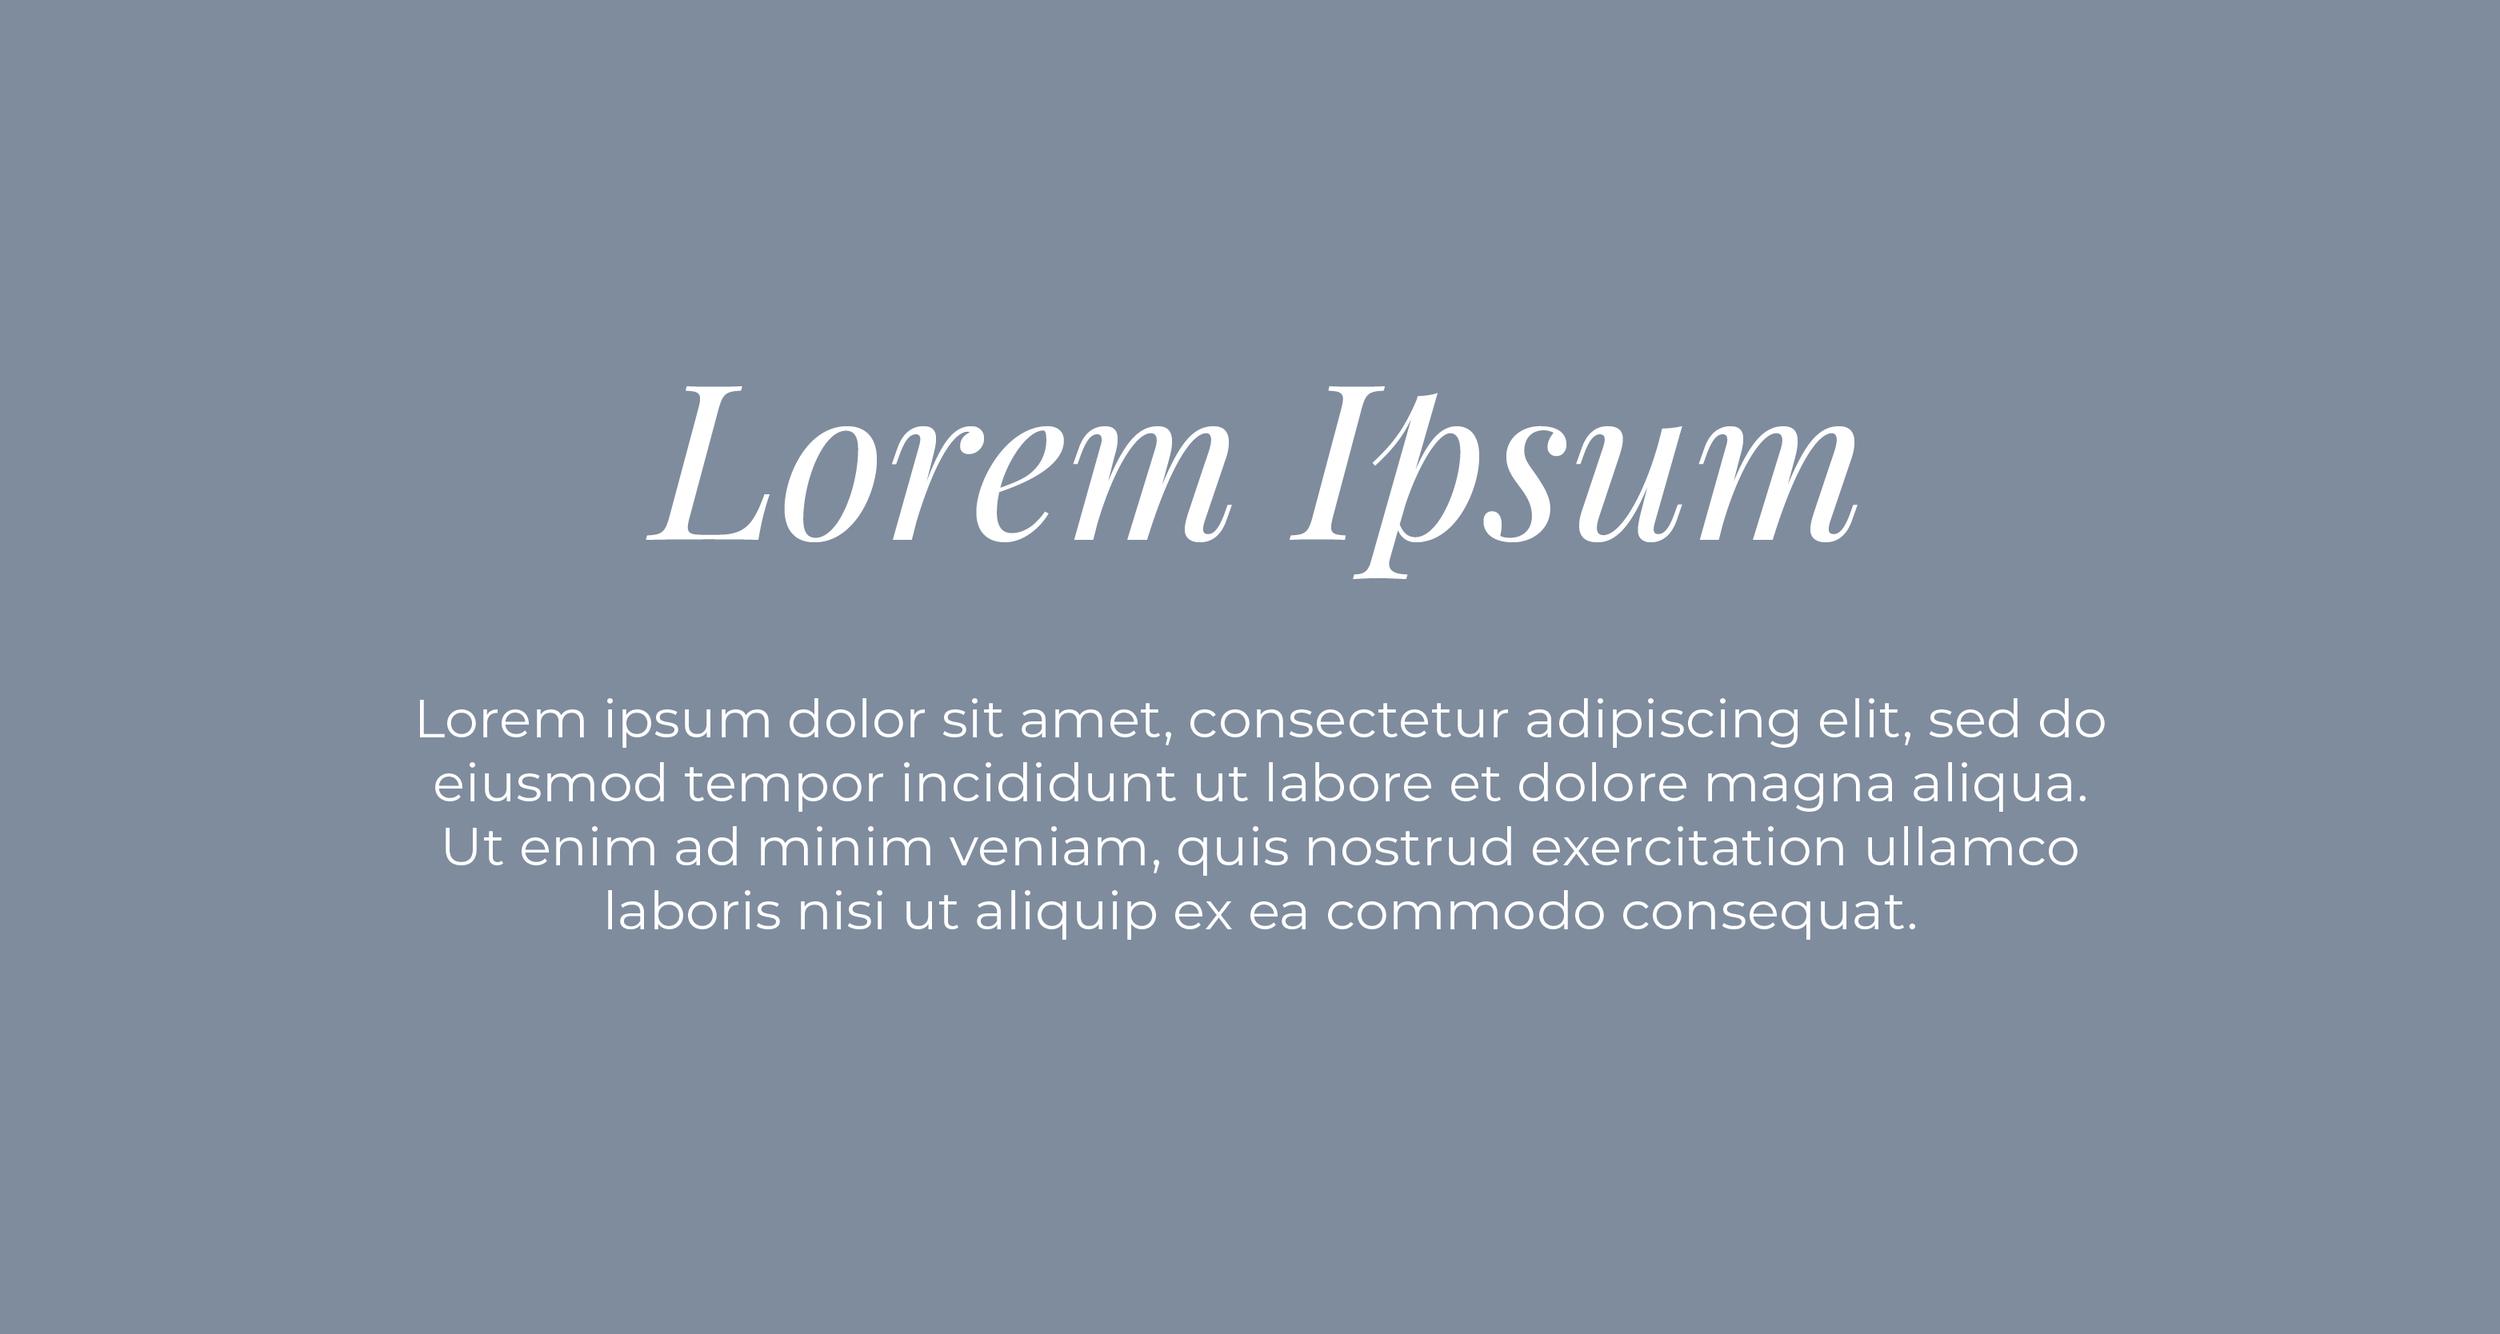 Playfair Display Regular Italic (header) paired with Montserrat Regular.